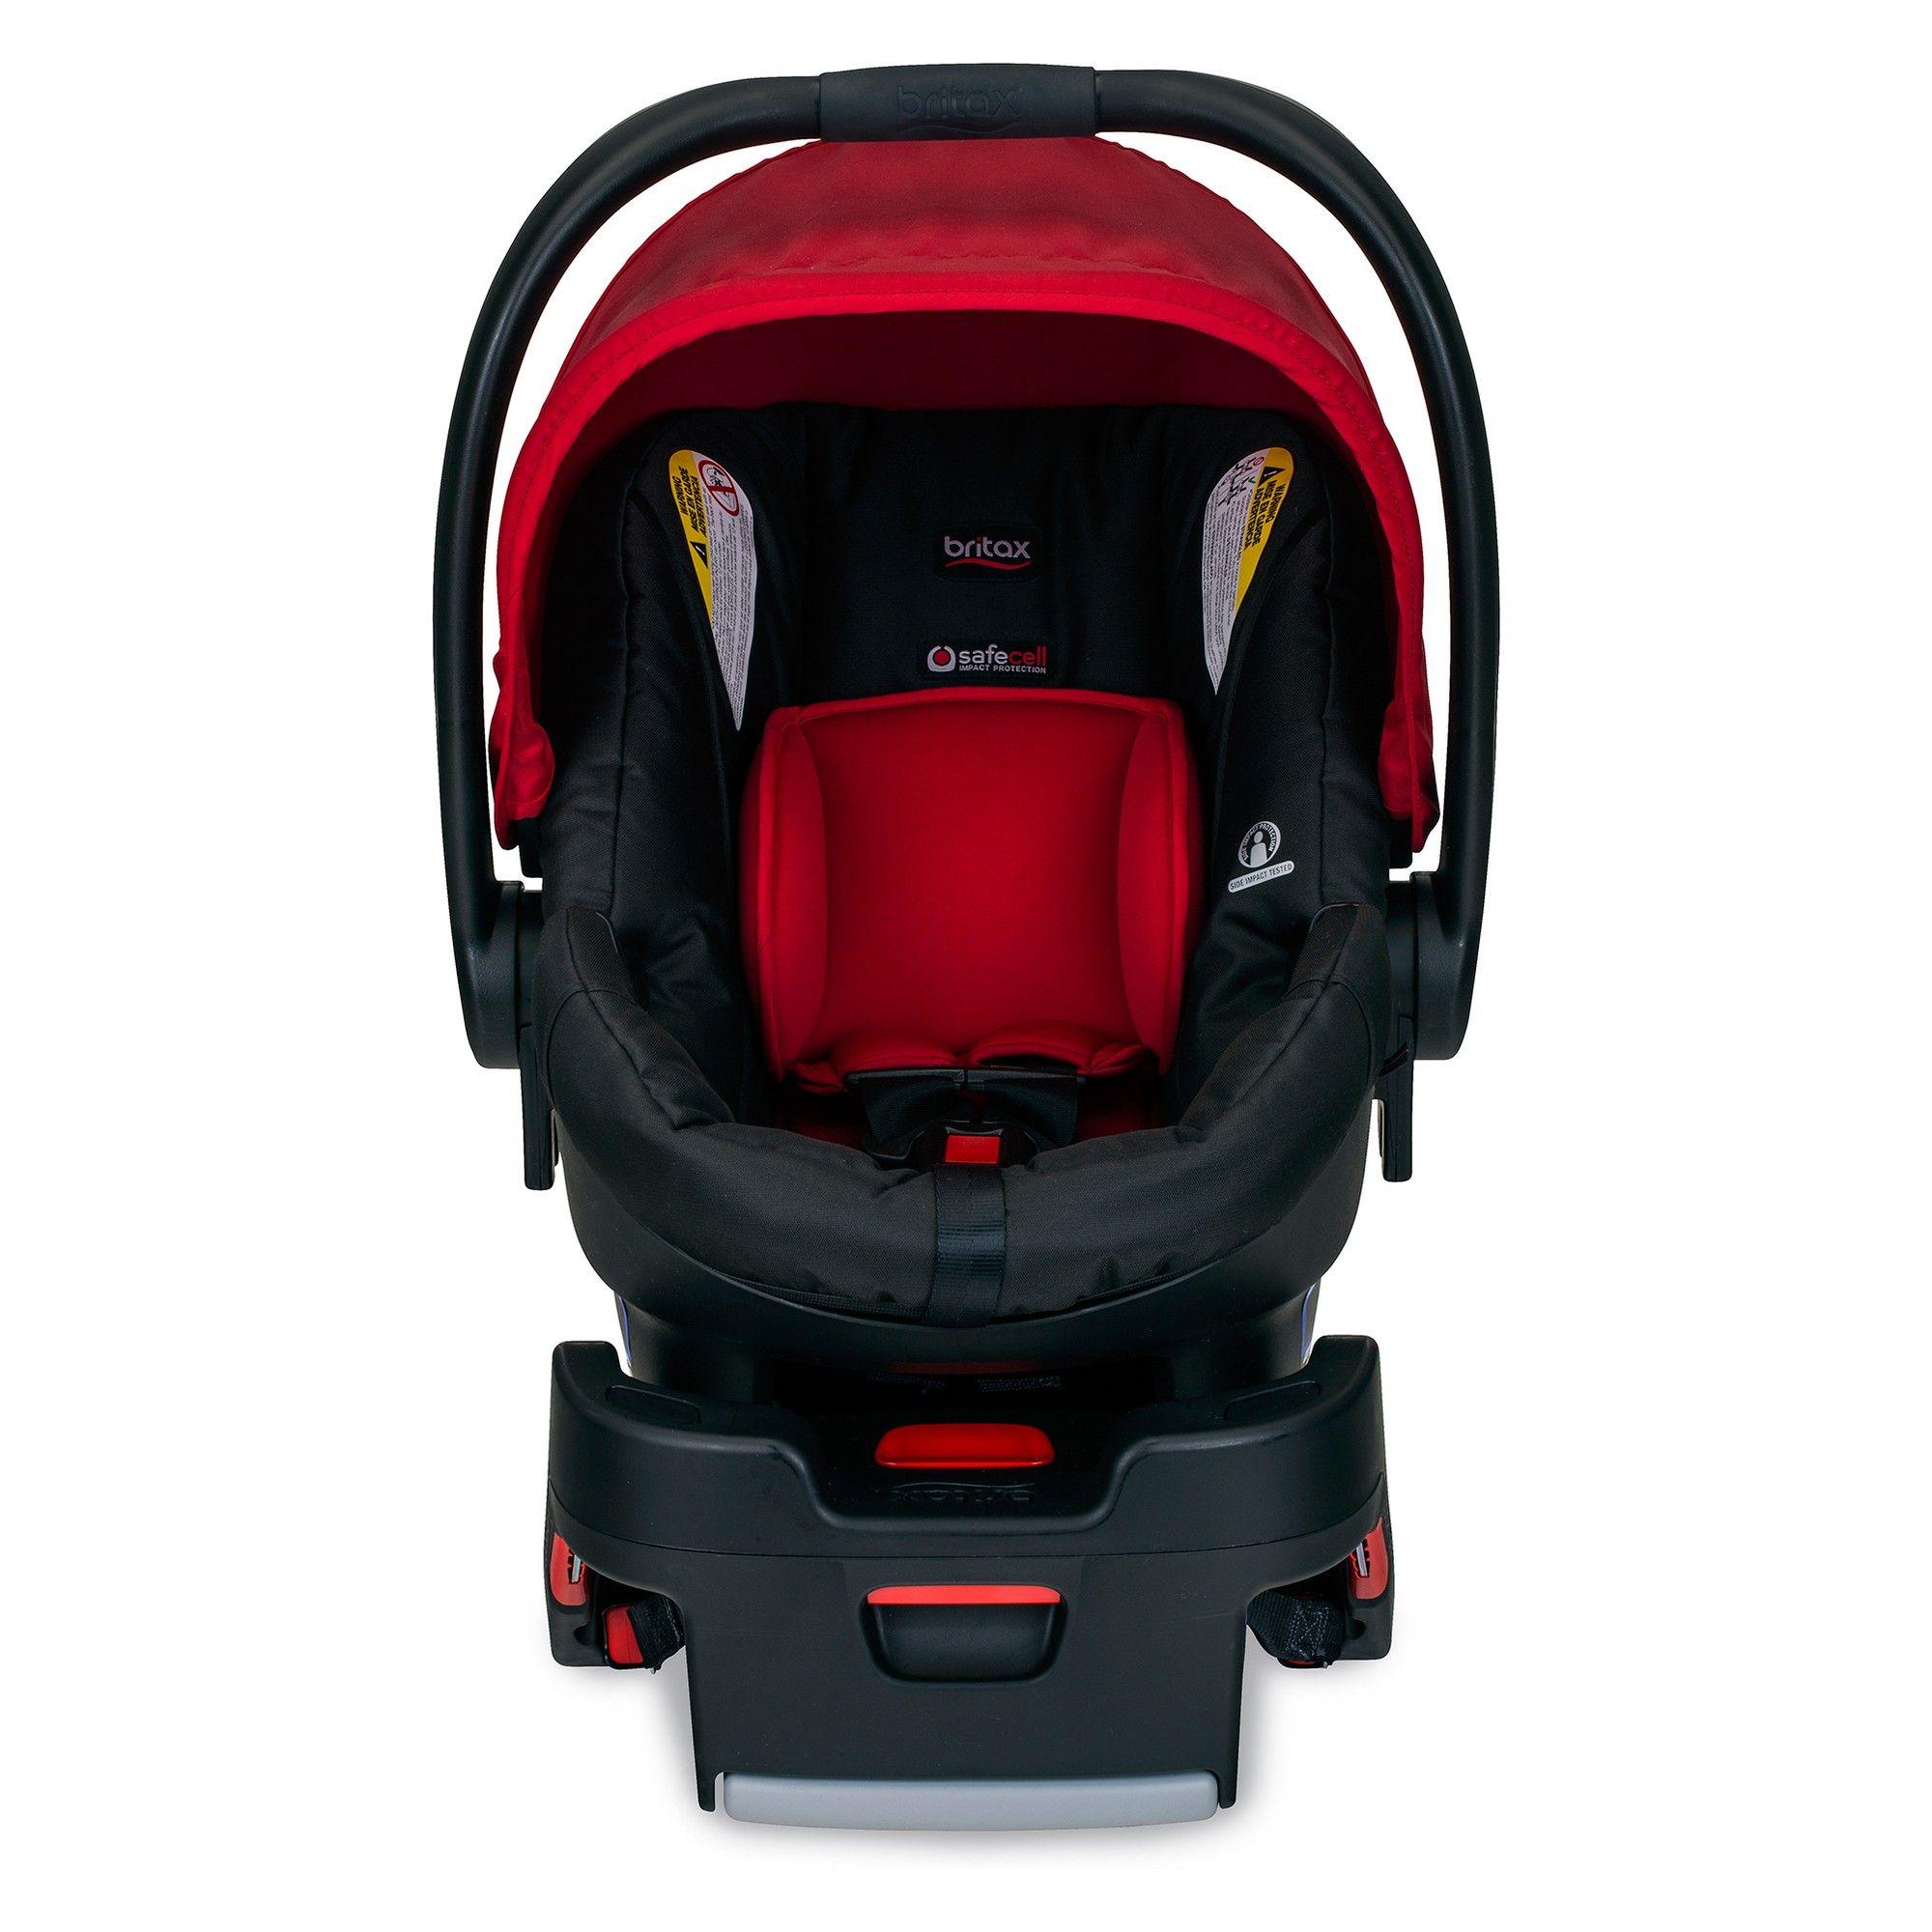 8505c5e7941 Jeep Car Seat Travel Bag #Car, #Jeep, #Seat | Little Kids Fashion |  Pinterest | Car seat travel bag, Car seats and Travel bags